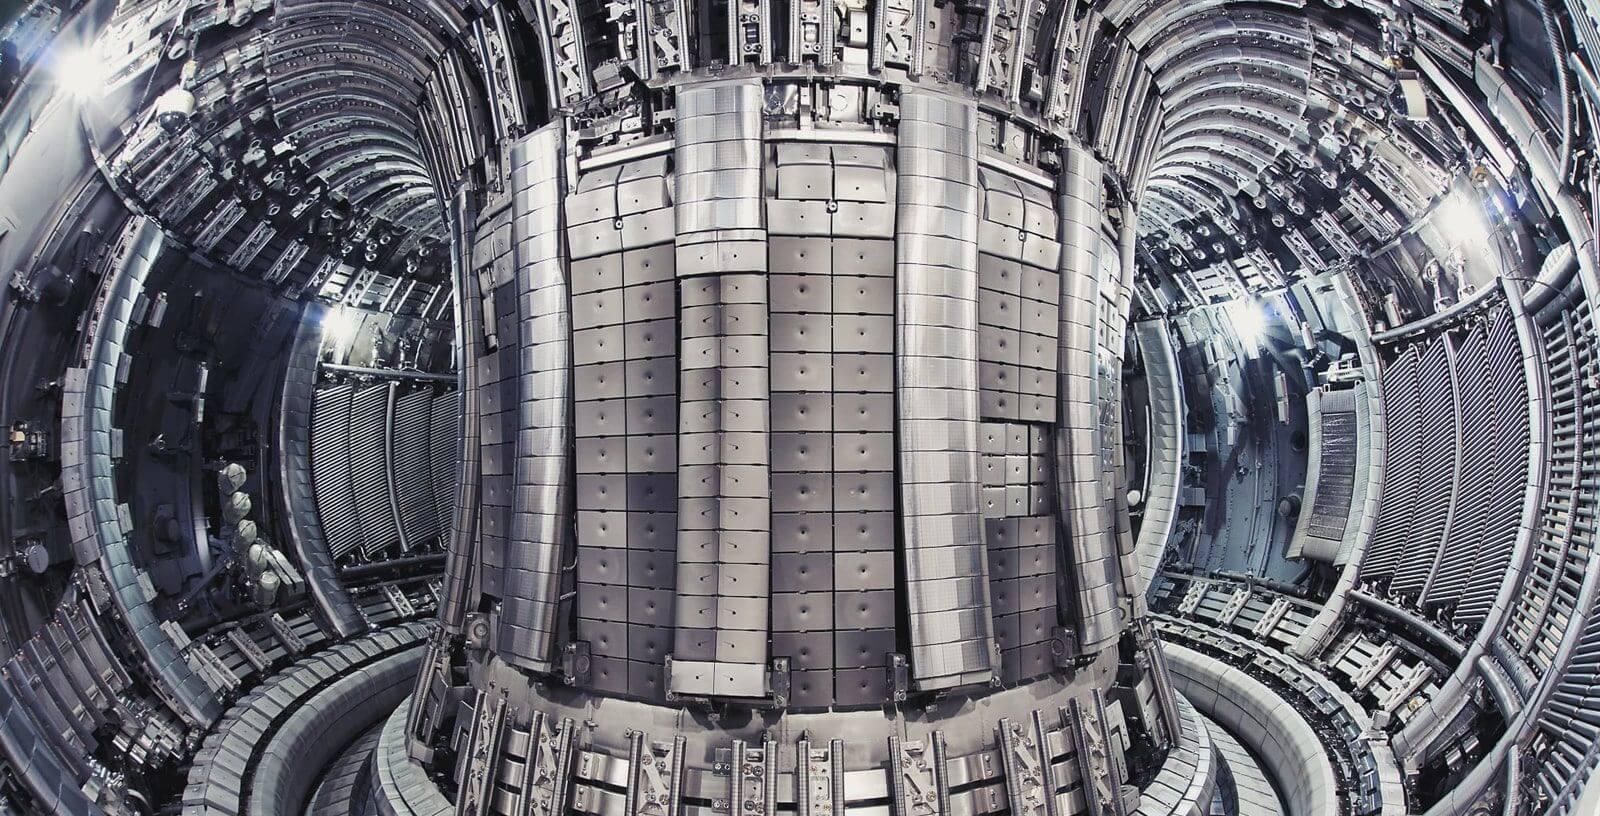 Idom_Nuclear_Services_CULHAM_CENTRE_FOR_FUSION_ENERGY_CCFE_Reliability_Studies_Joint_European_Torus_JET_experimental_reactor